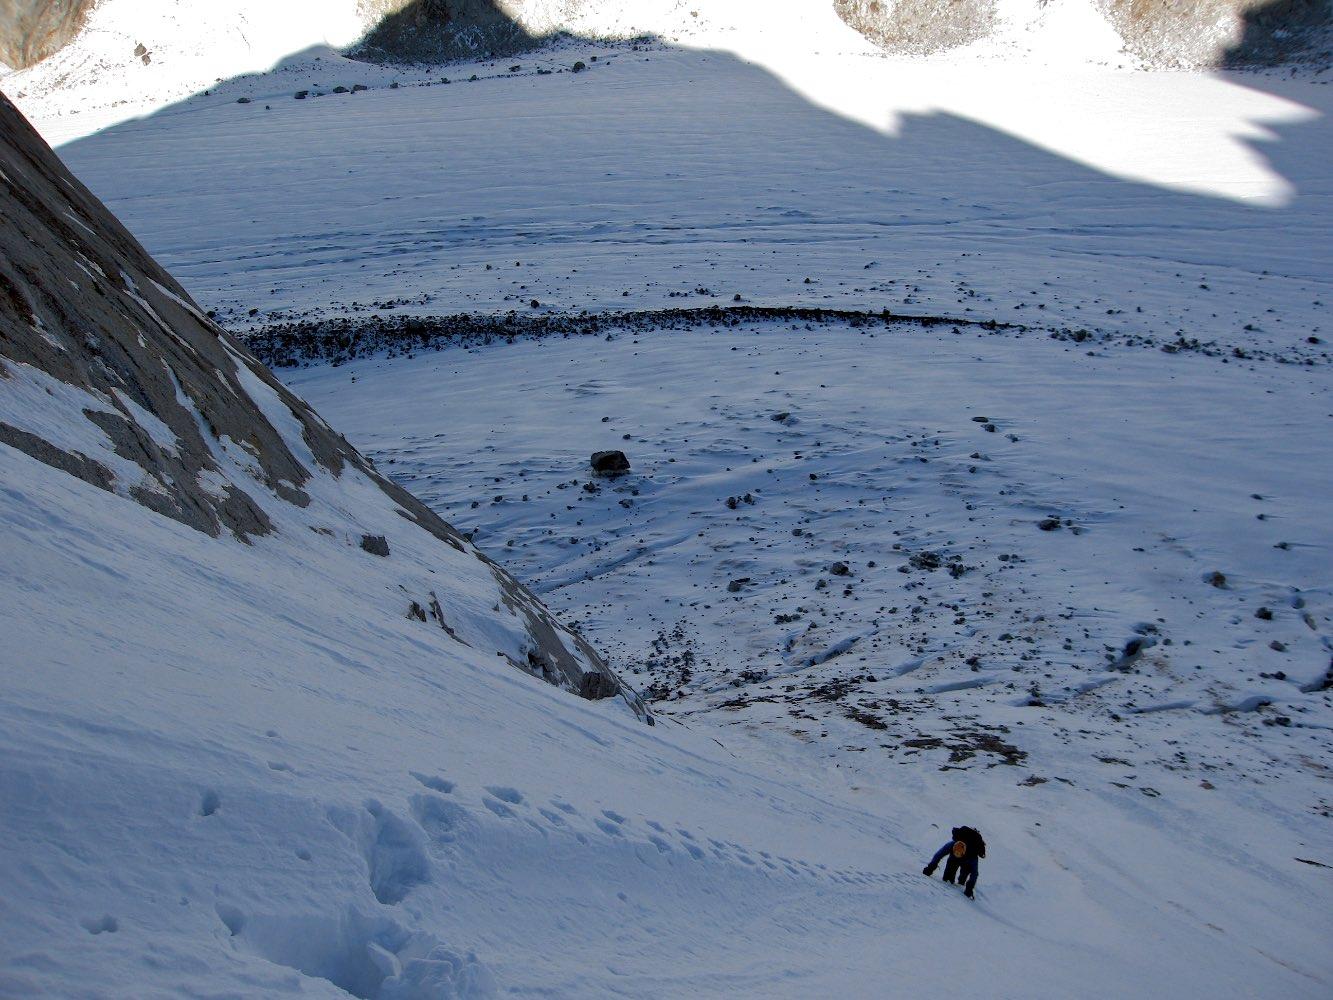 Long cold couloir ascent to gain Triple Crown's north-west ridge